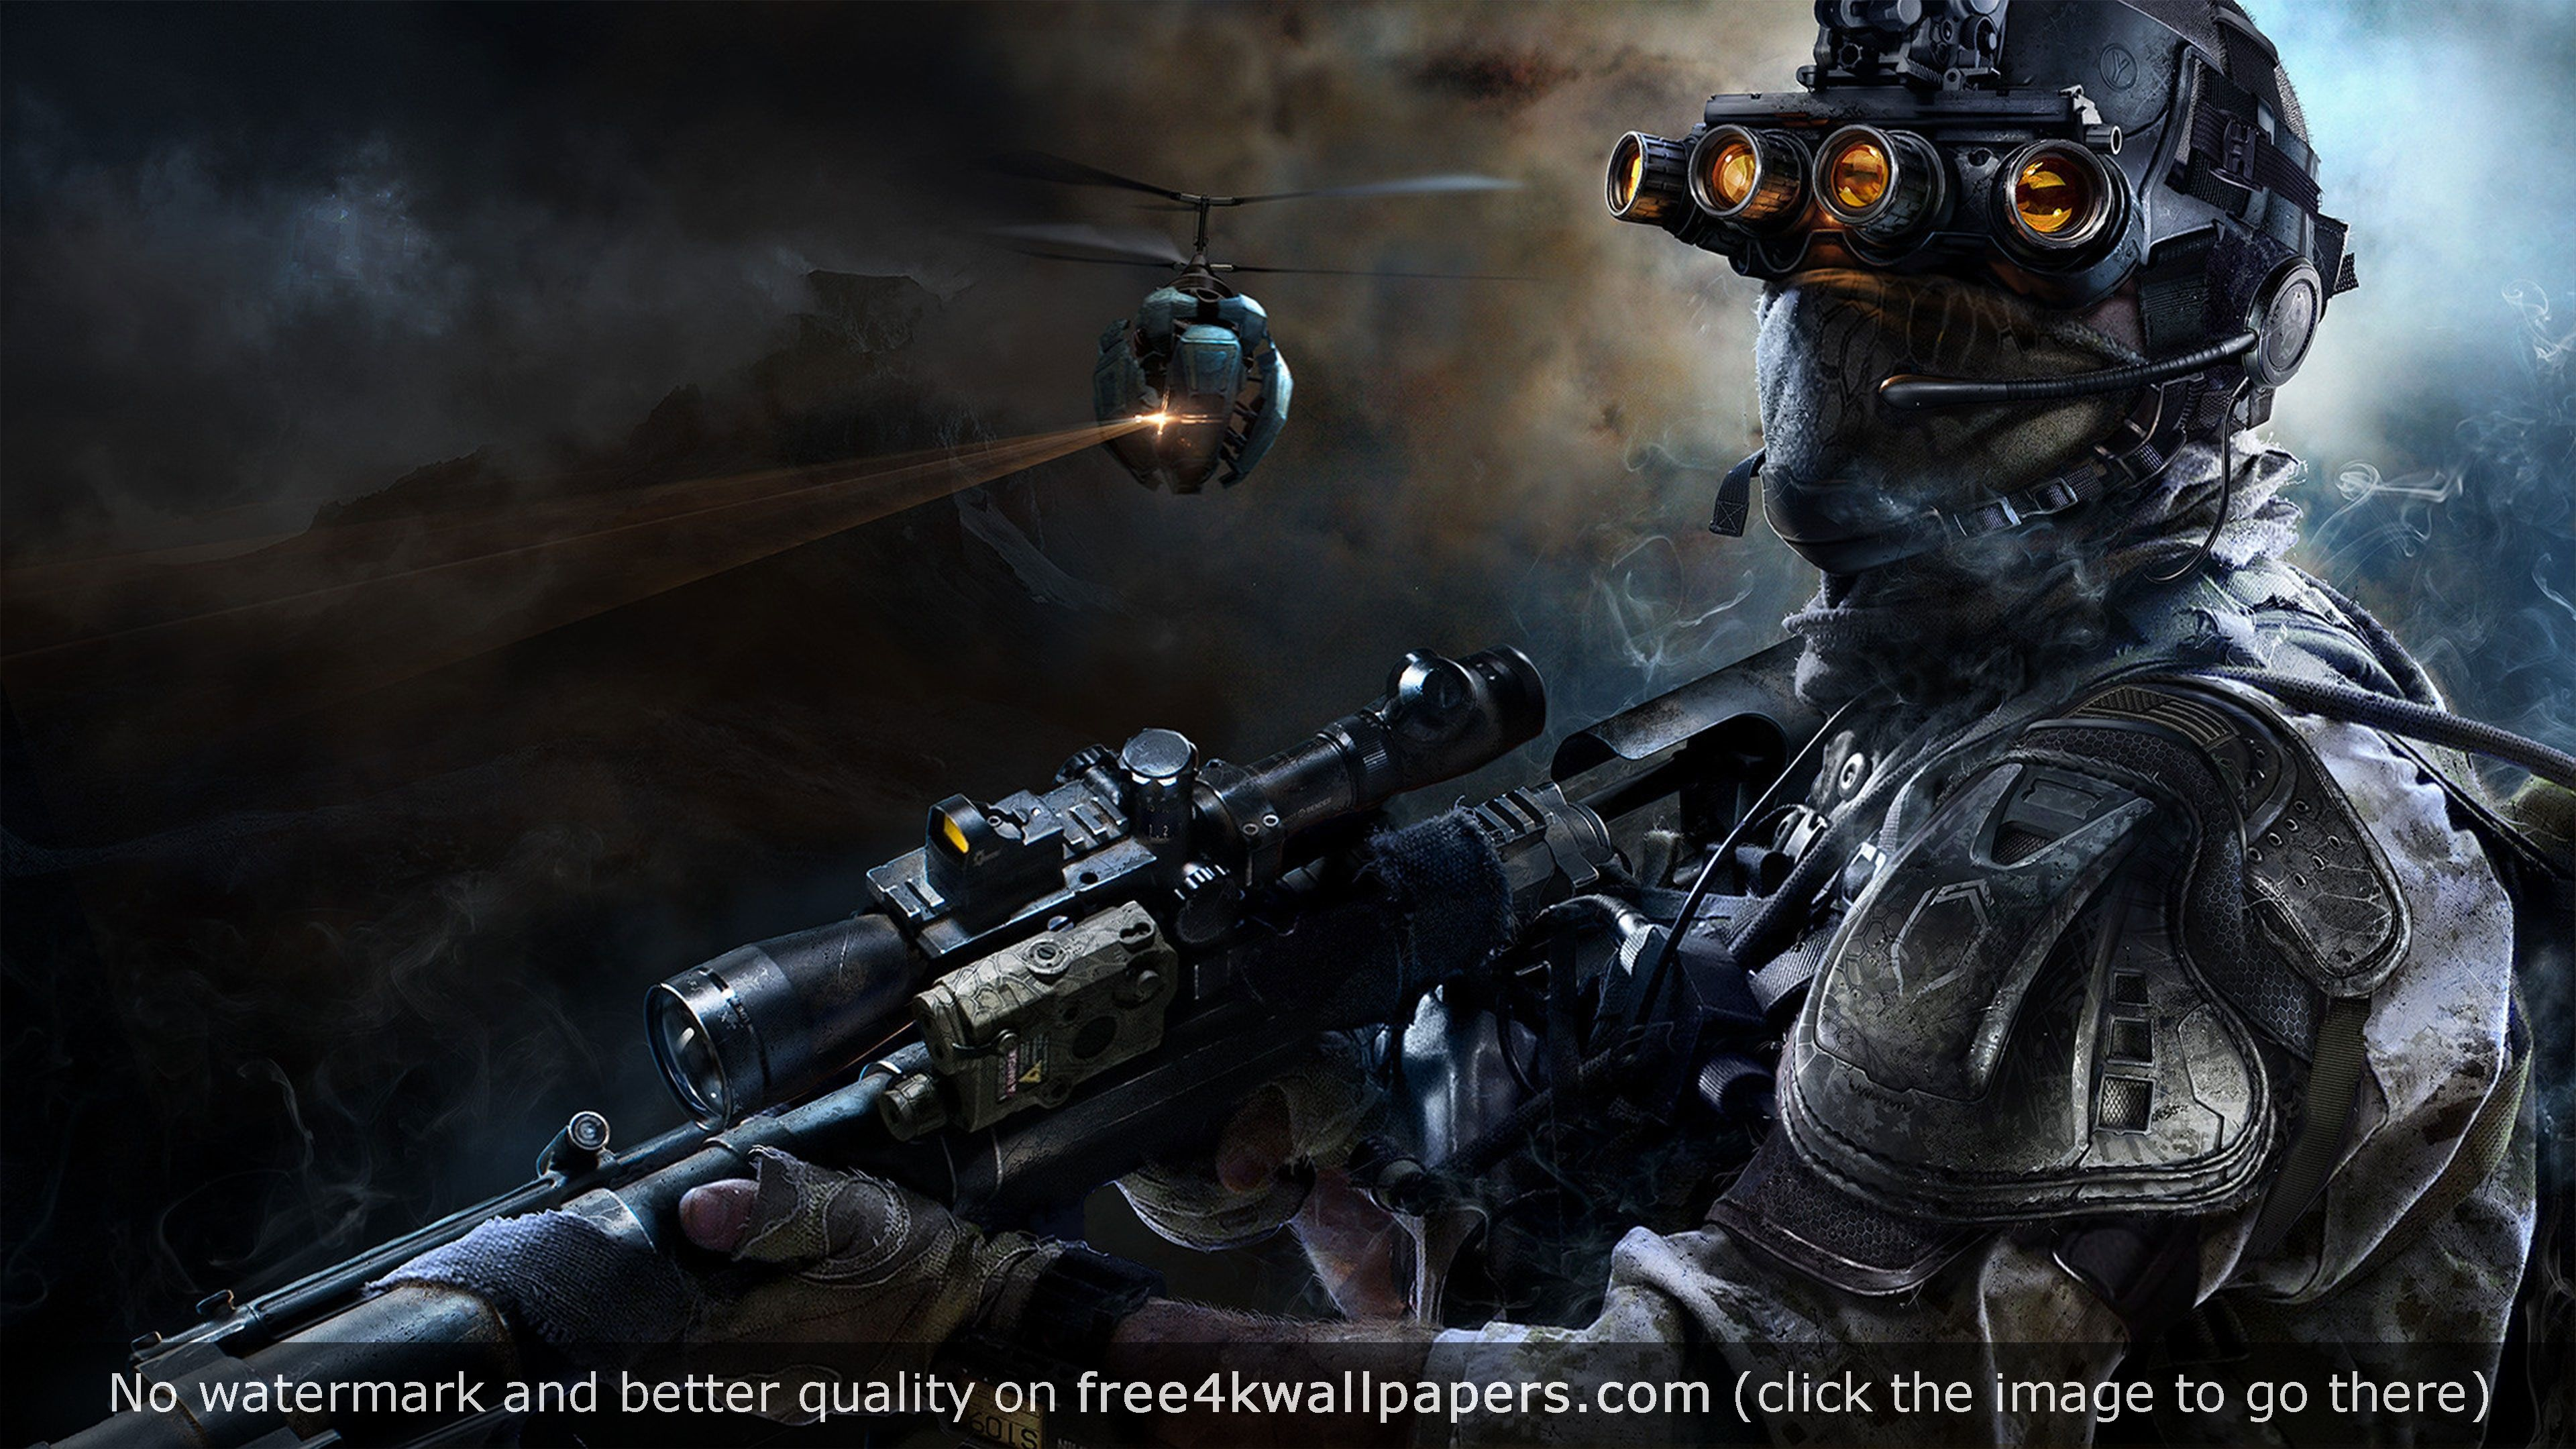 Sniper ghost warrior 4k 4k wallpaper desktop wallpapers pinterest sniper ghost warrior 4k 4k wallpaper voltagebd Images